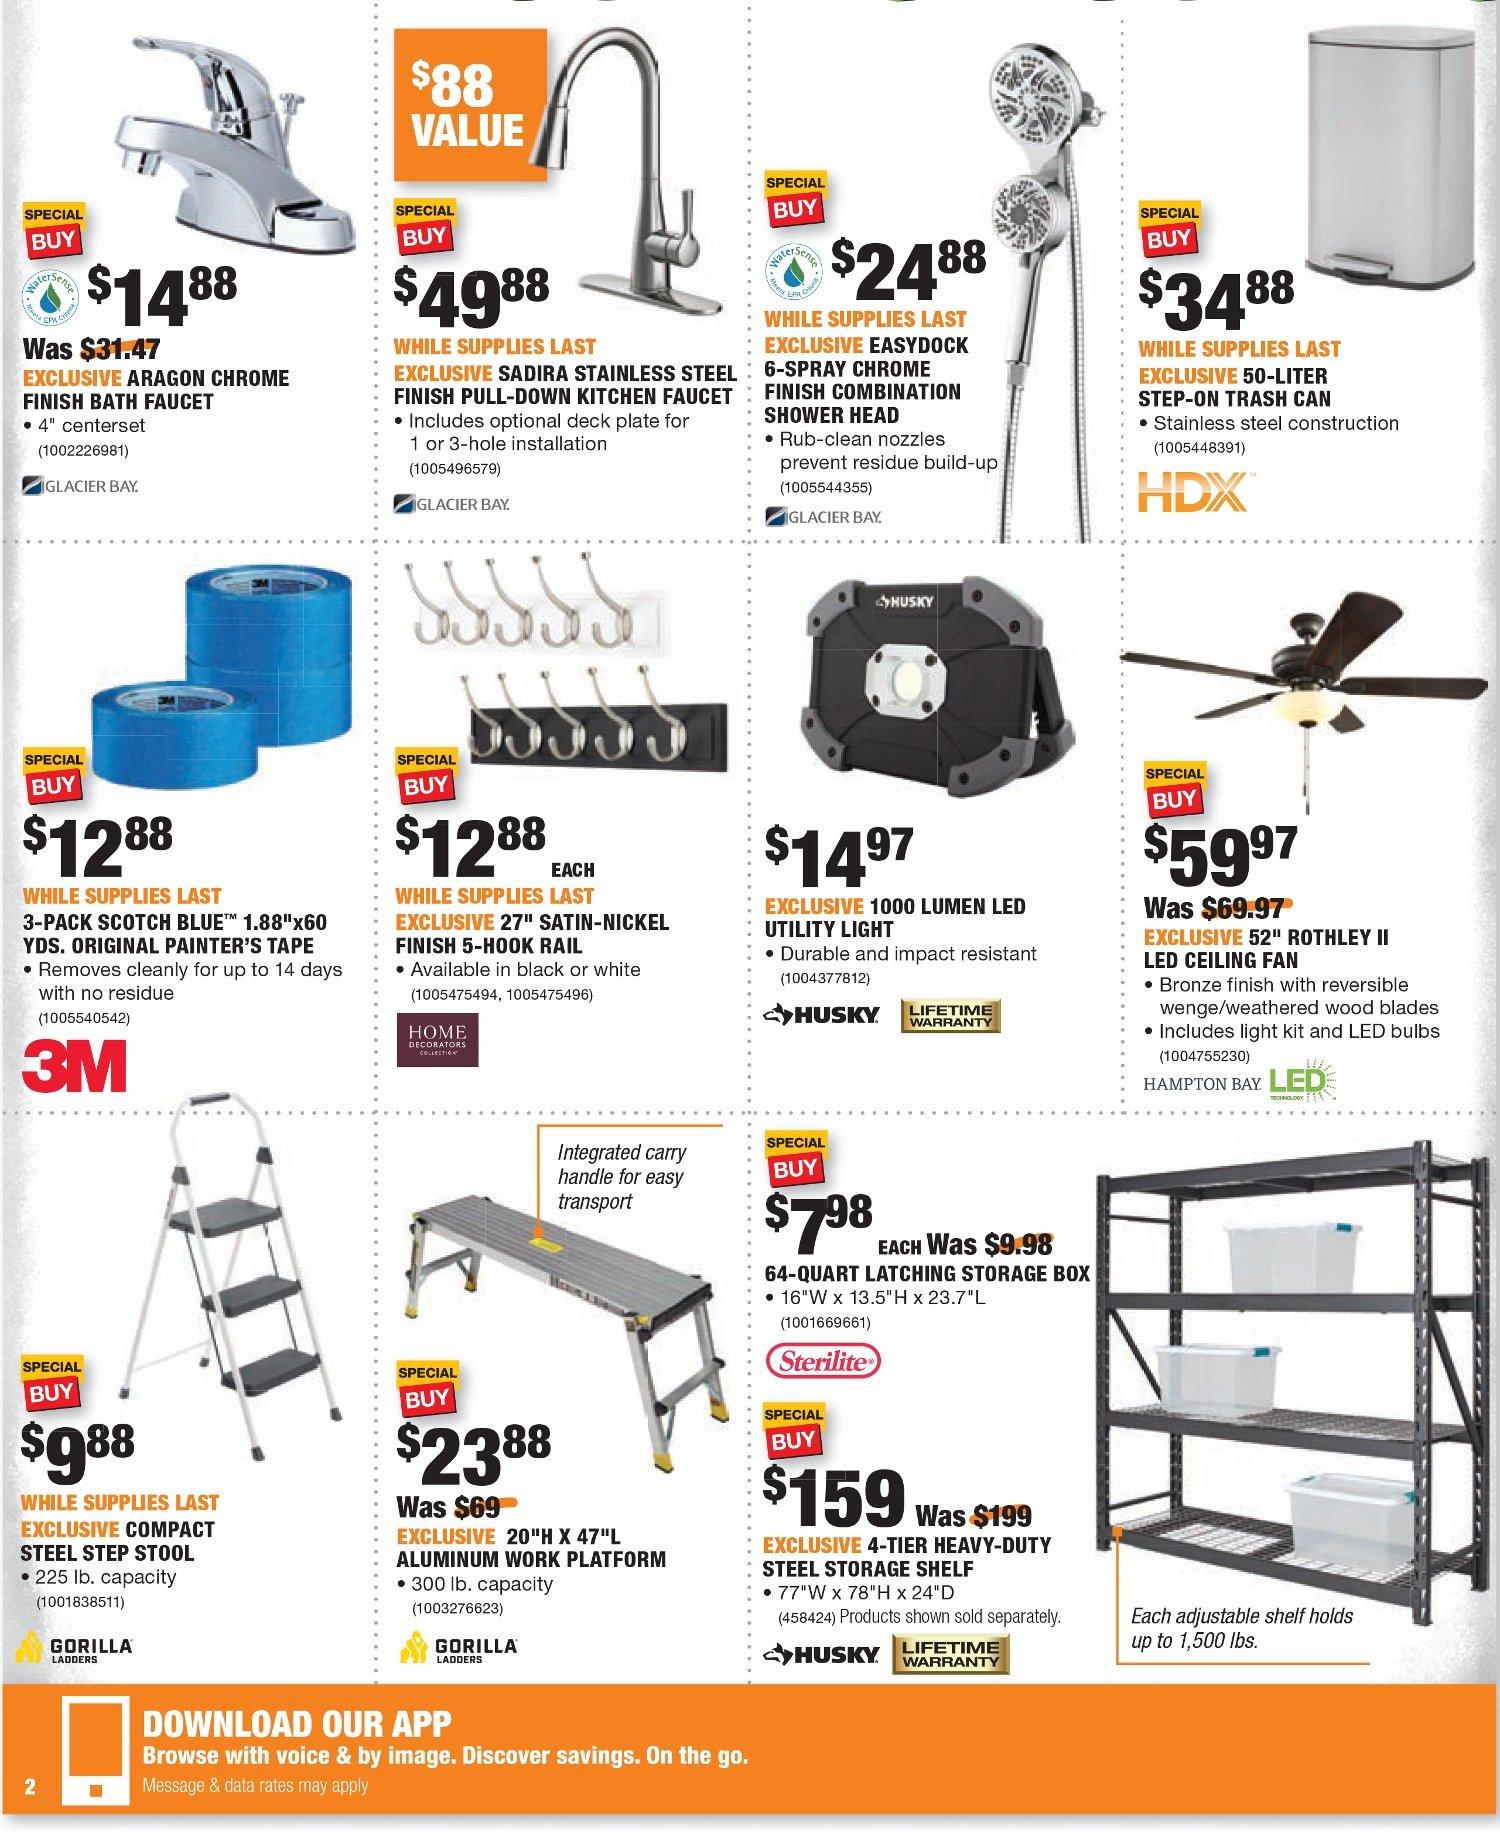 Shopper Home Depot Pr : shopper, depot, Black, Friday, Puerto, Depot, Shopper, Decor